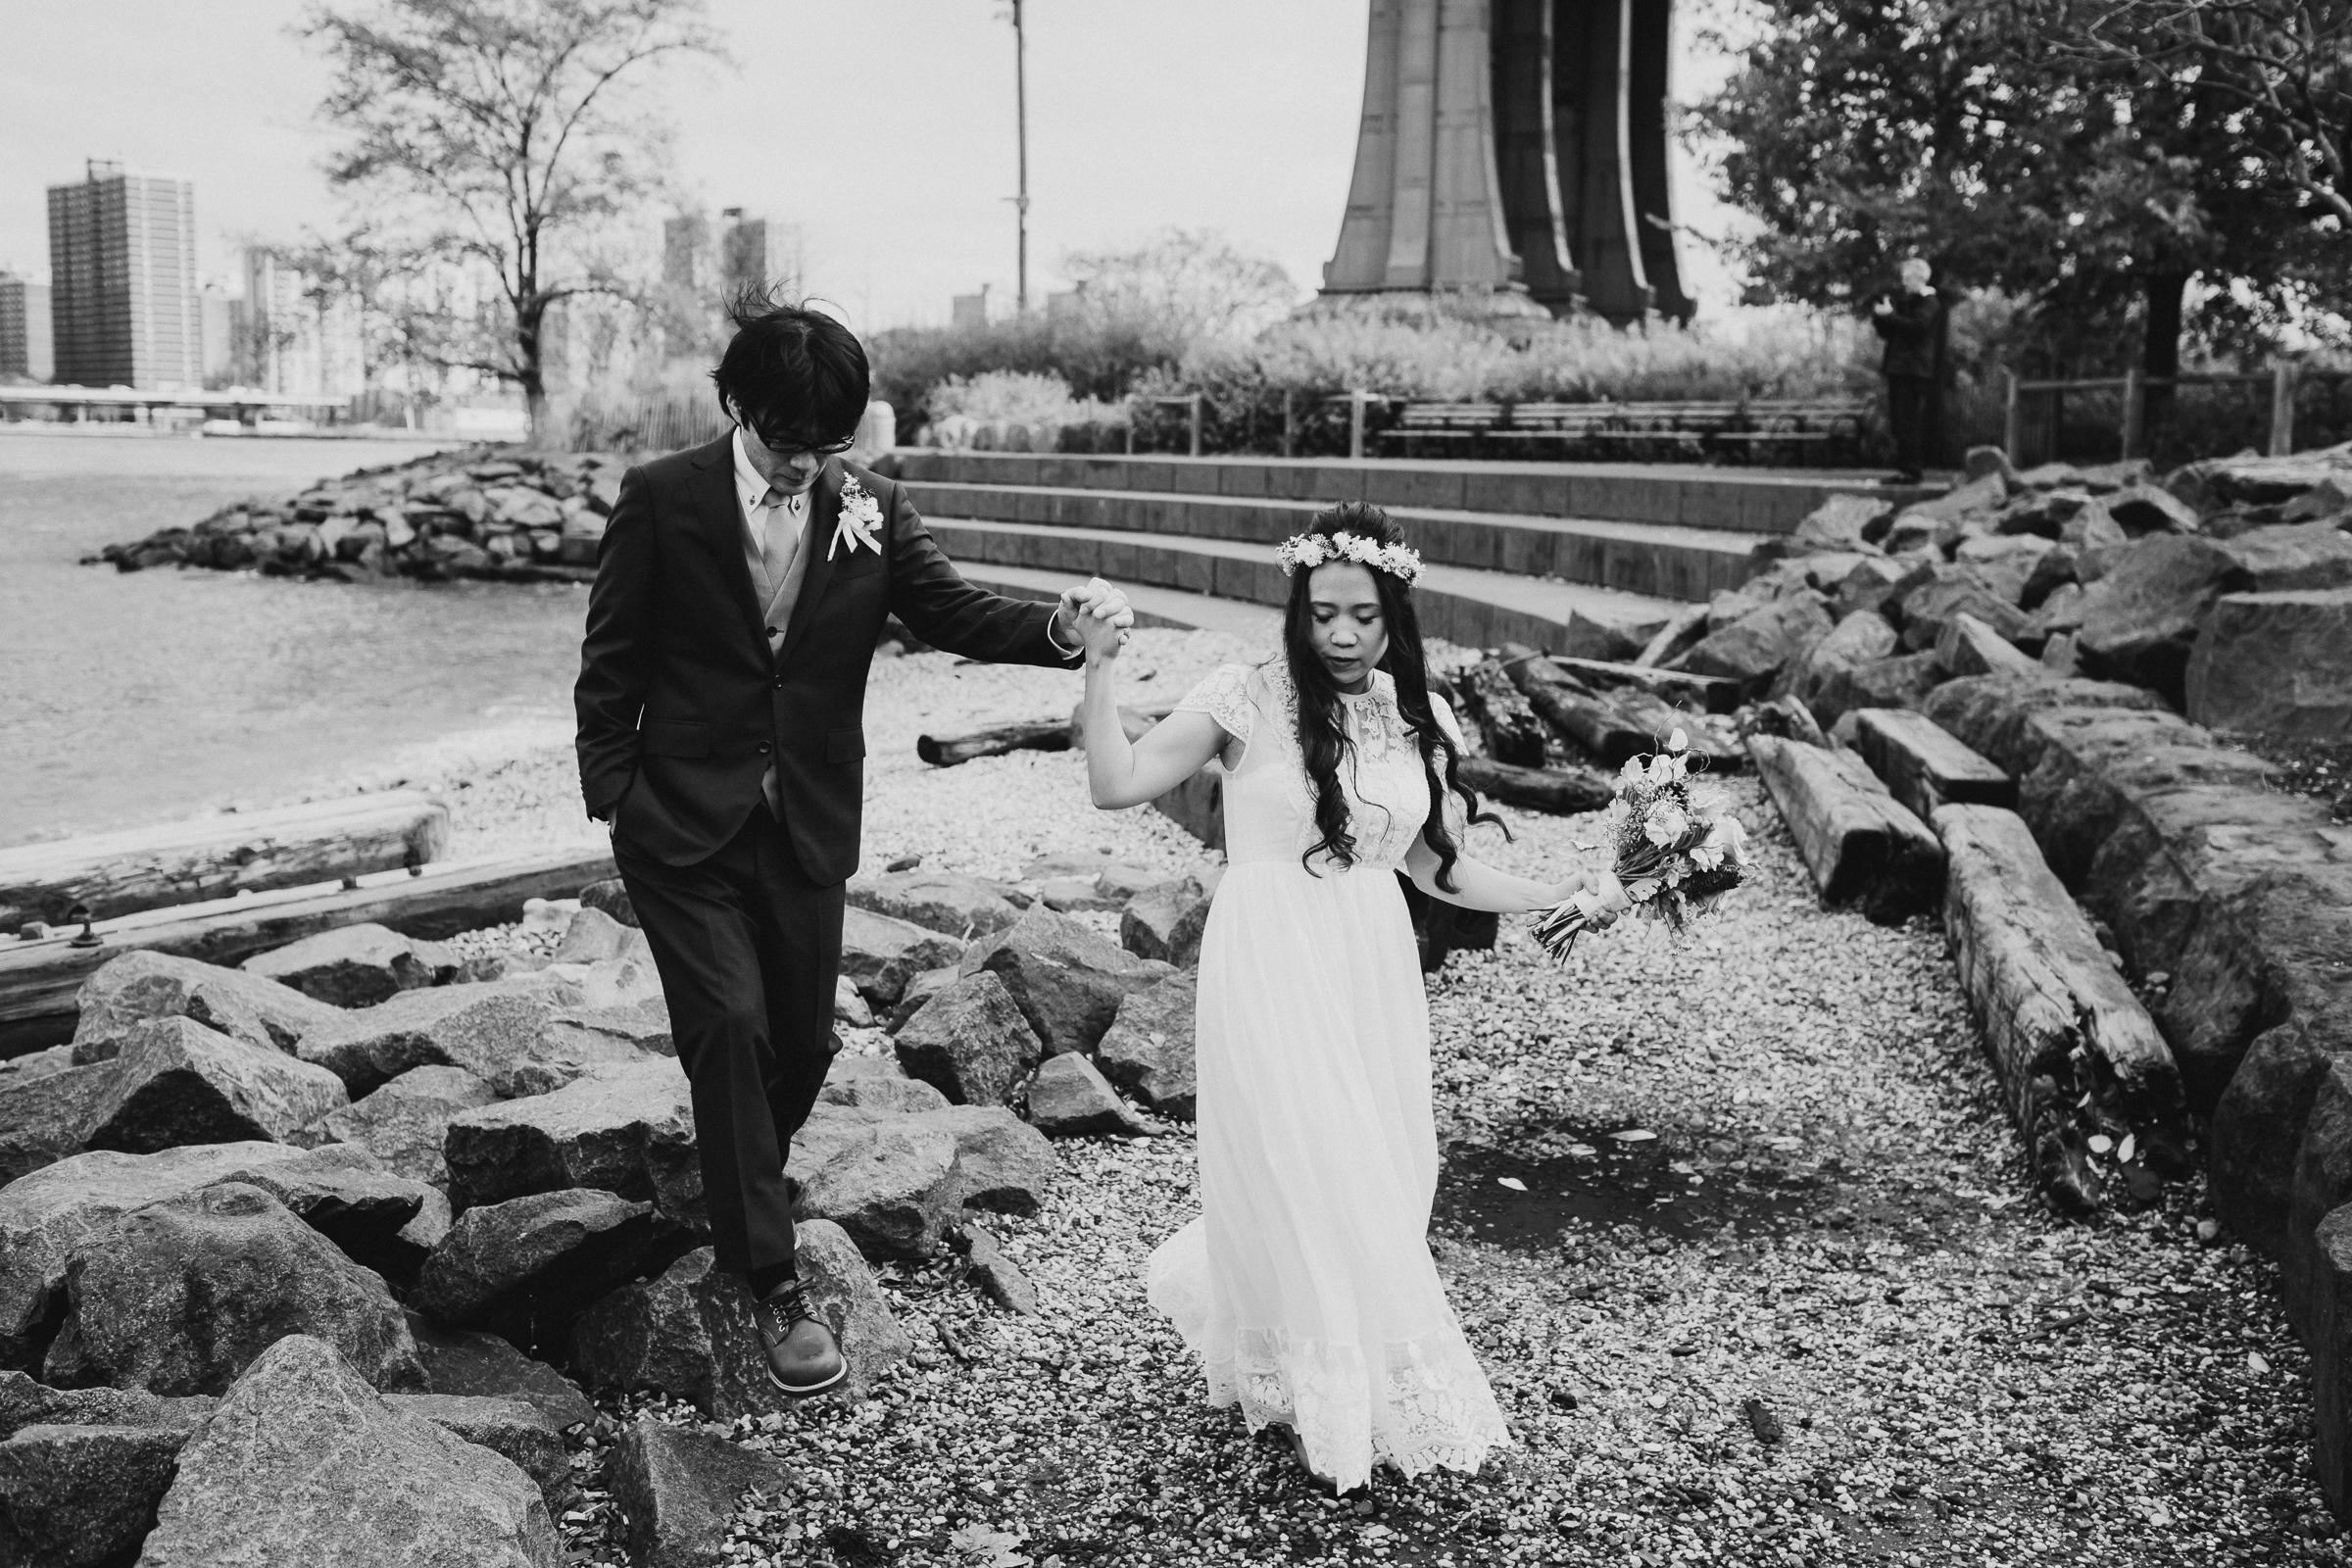 Central-Park-Brooklyn-Bridge-Dumbo-NYC-Documentary-Wedding-Photographer-10.jpg